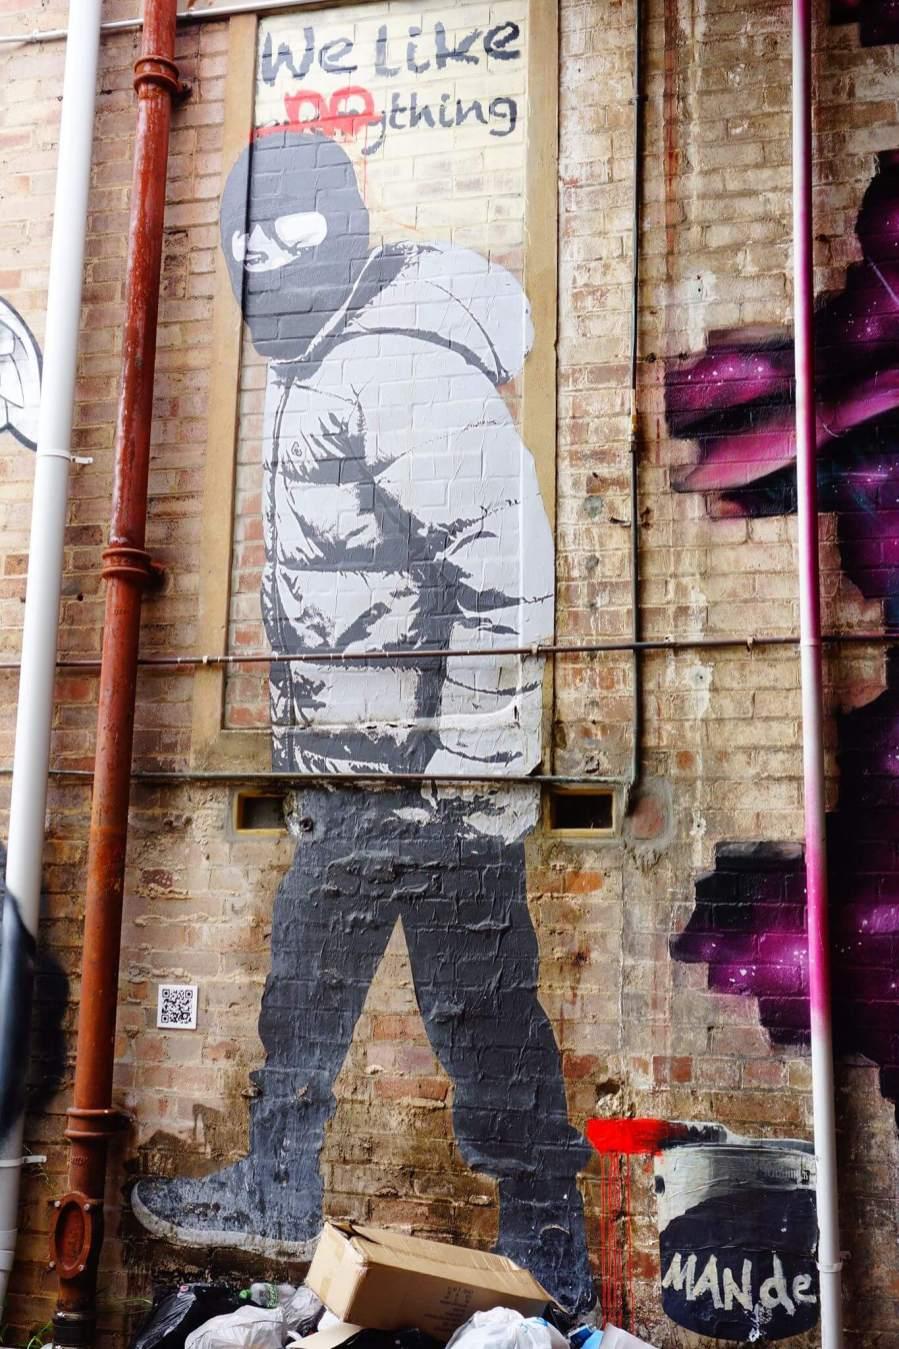 Kootoomba-street-art-australia-photo-credit-jessical-Beavon-2